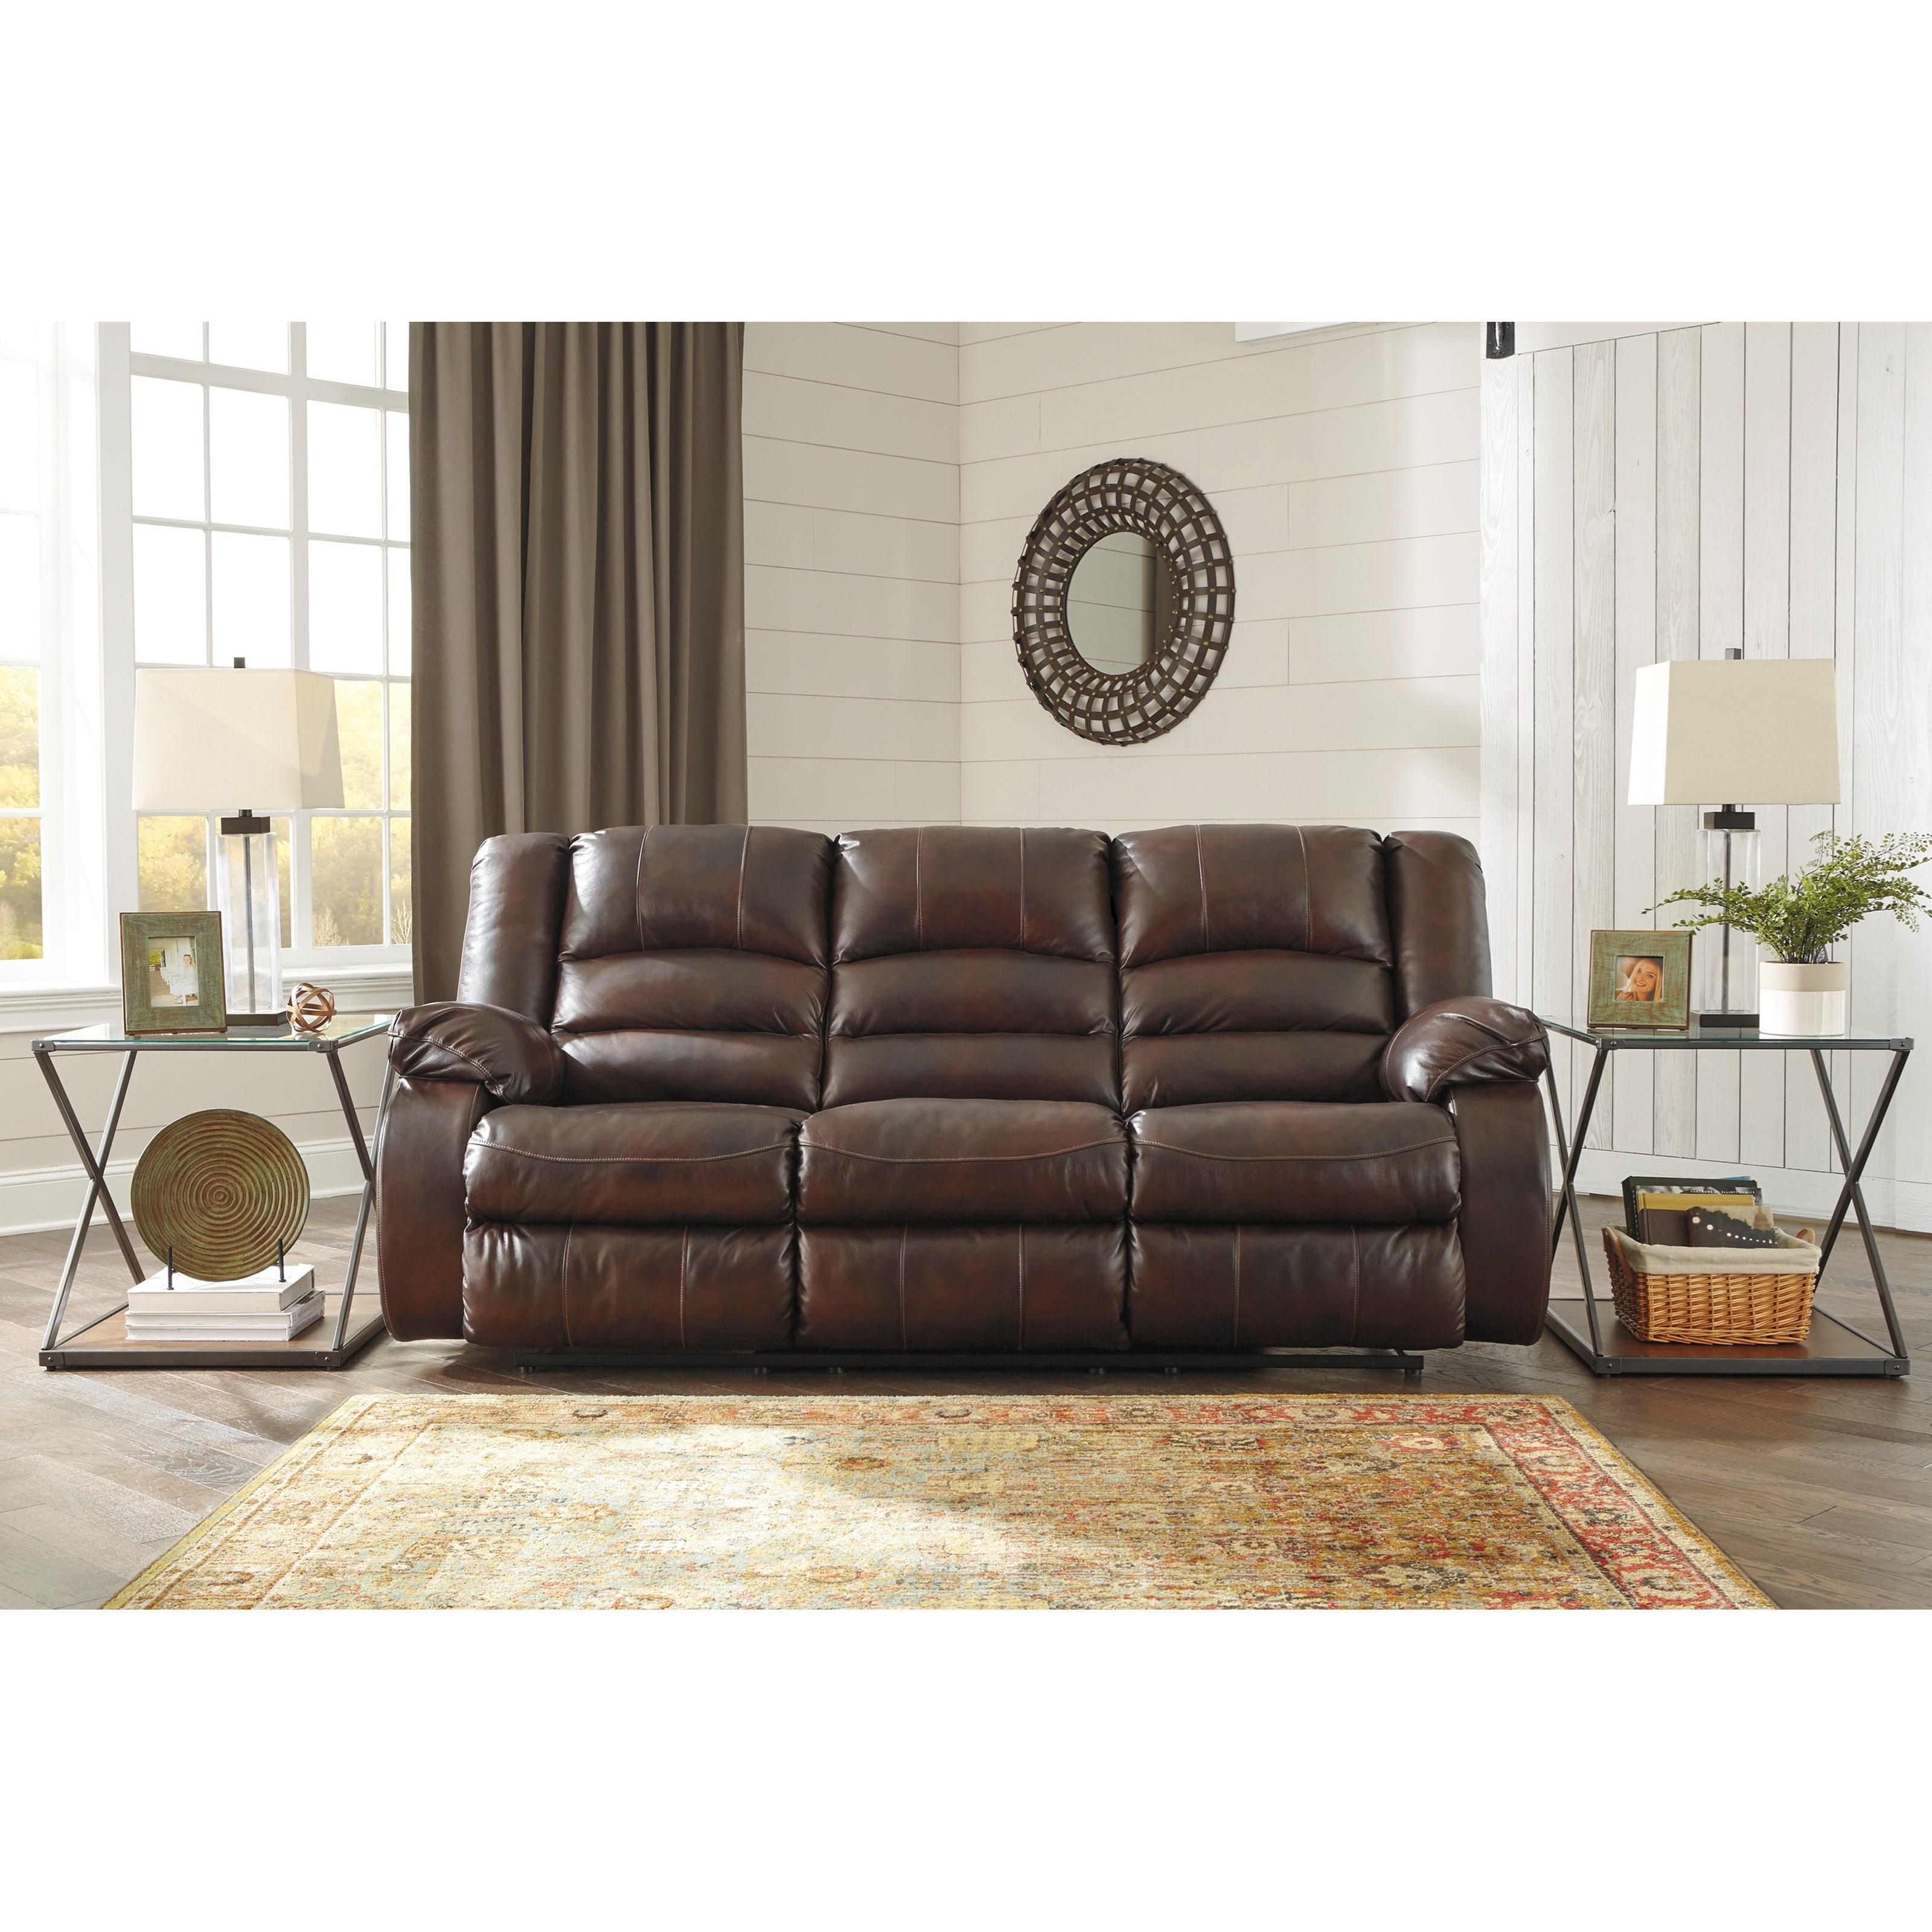 Ashley Furniture Manufacturer: Signature Design By Ashley Levelland Leather Match